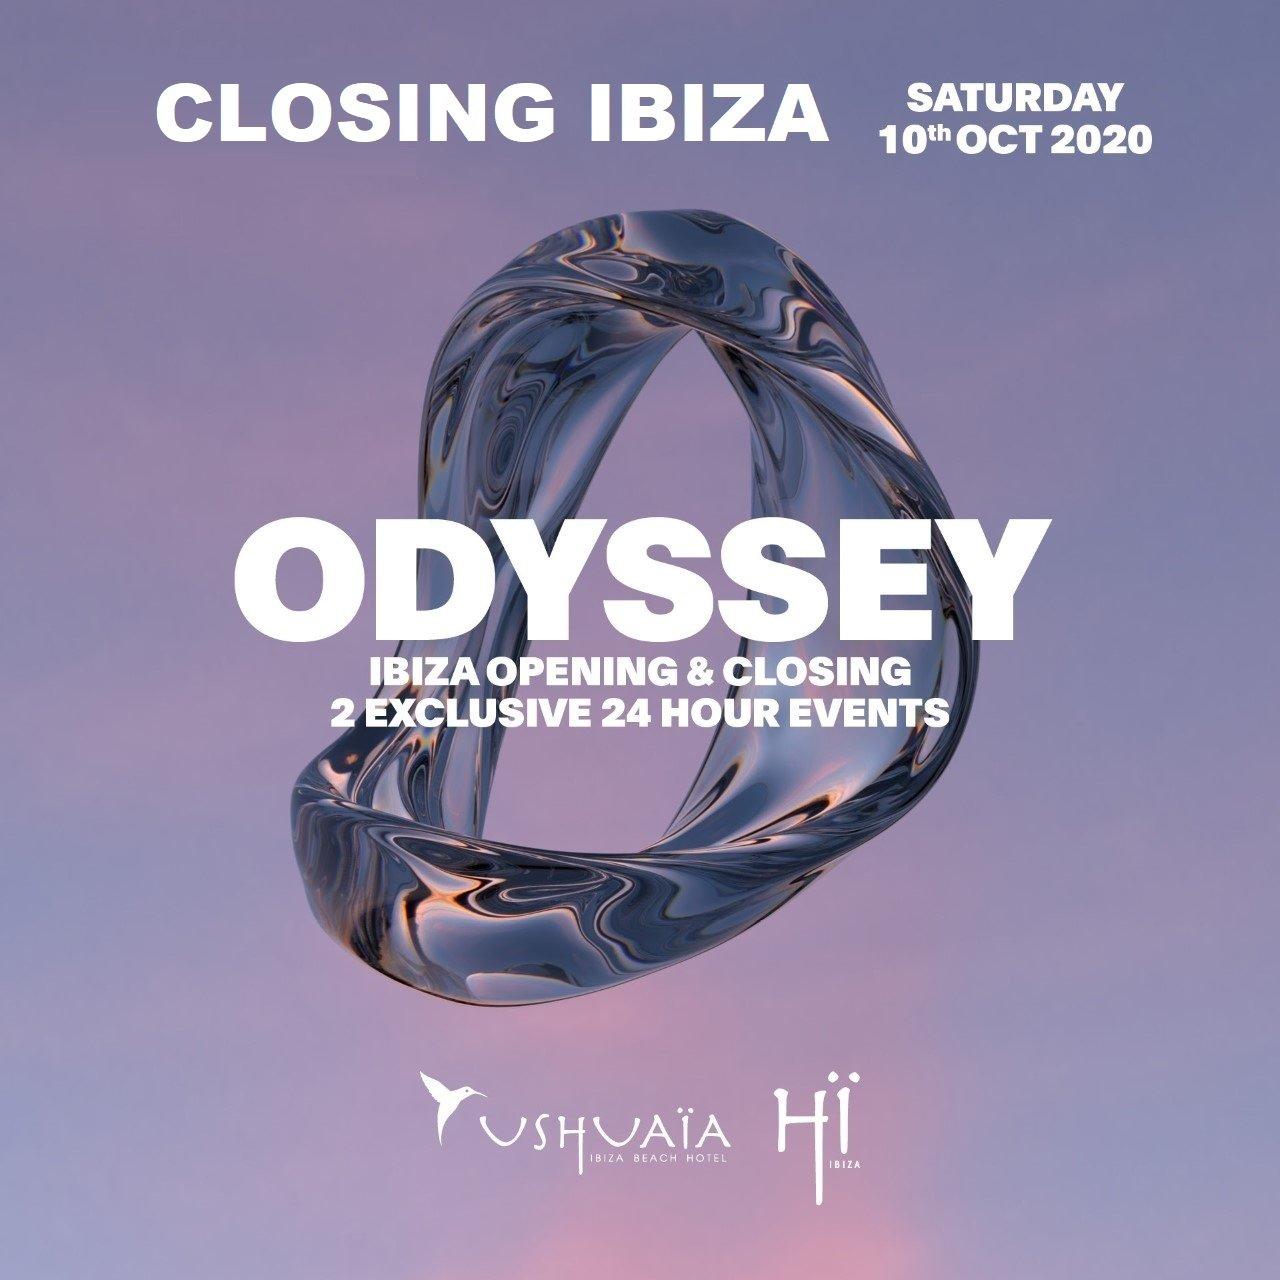 Closing Ibiza